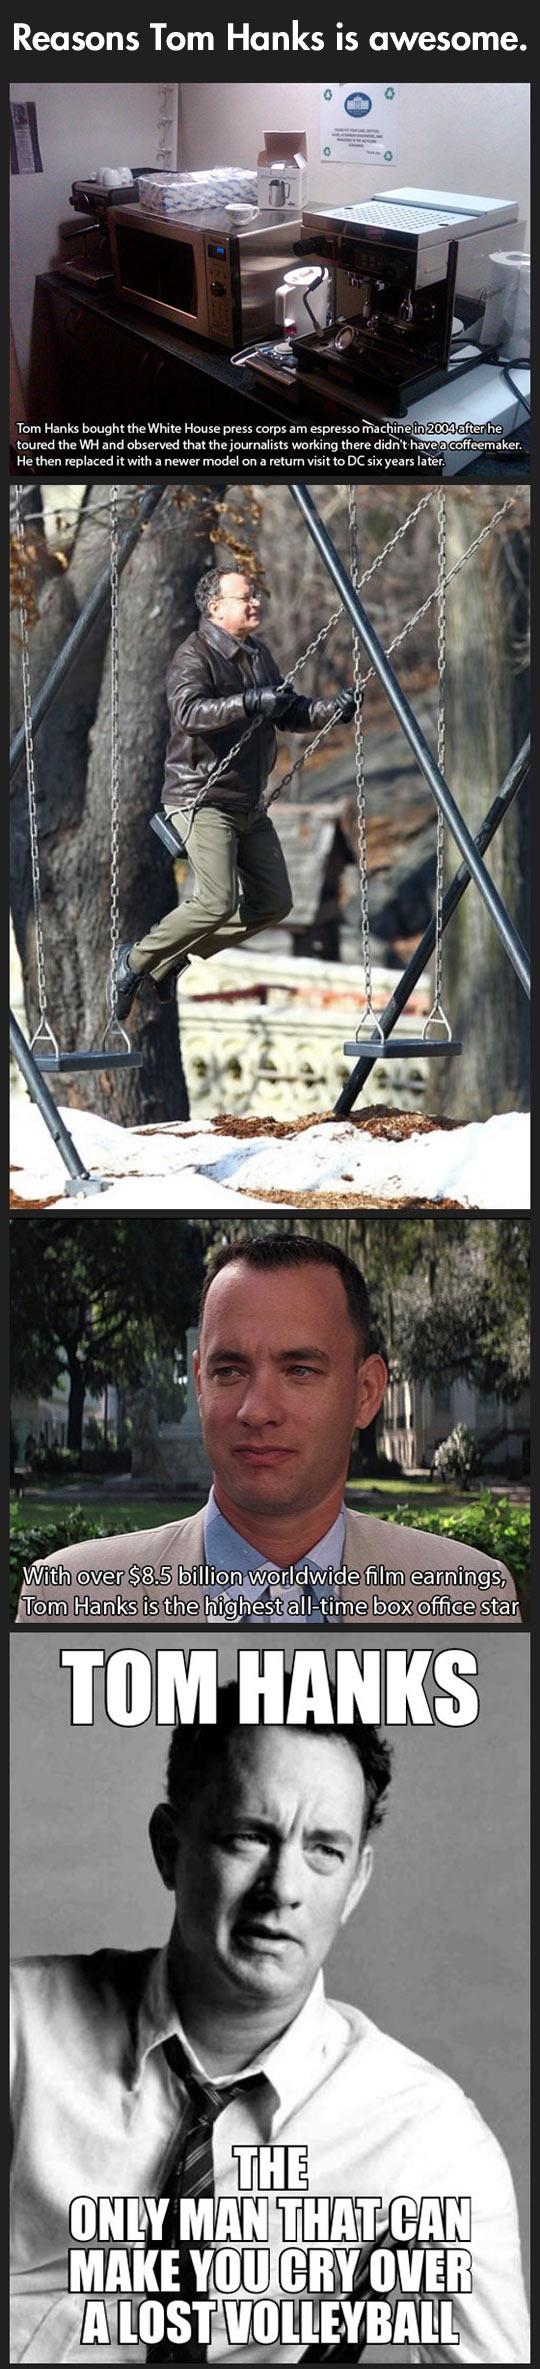 funny-Tom-Hanks-espresso-machine